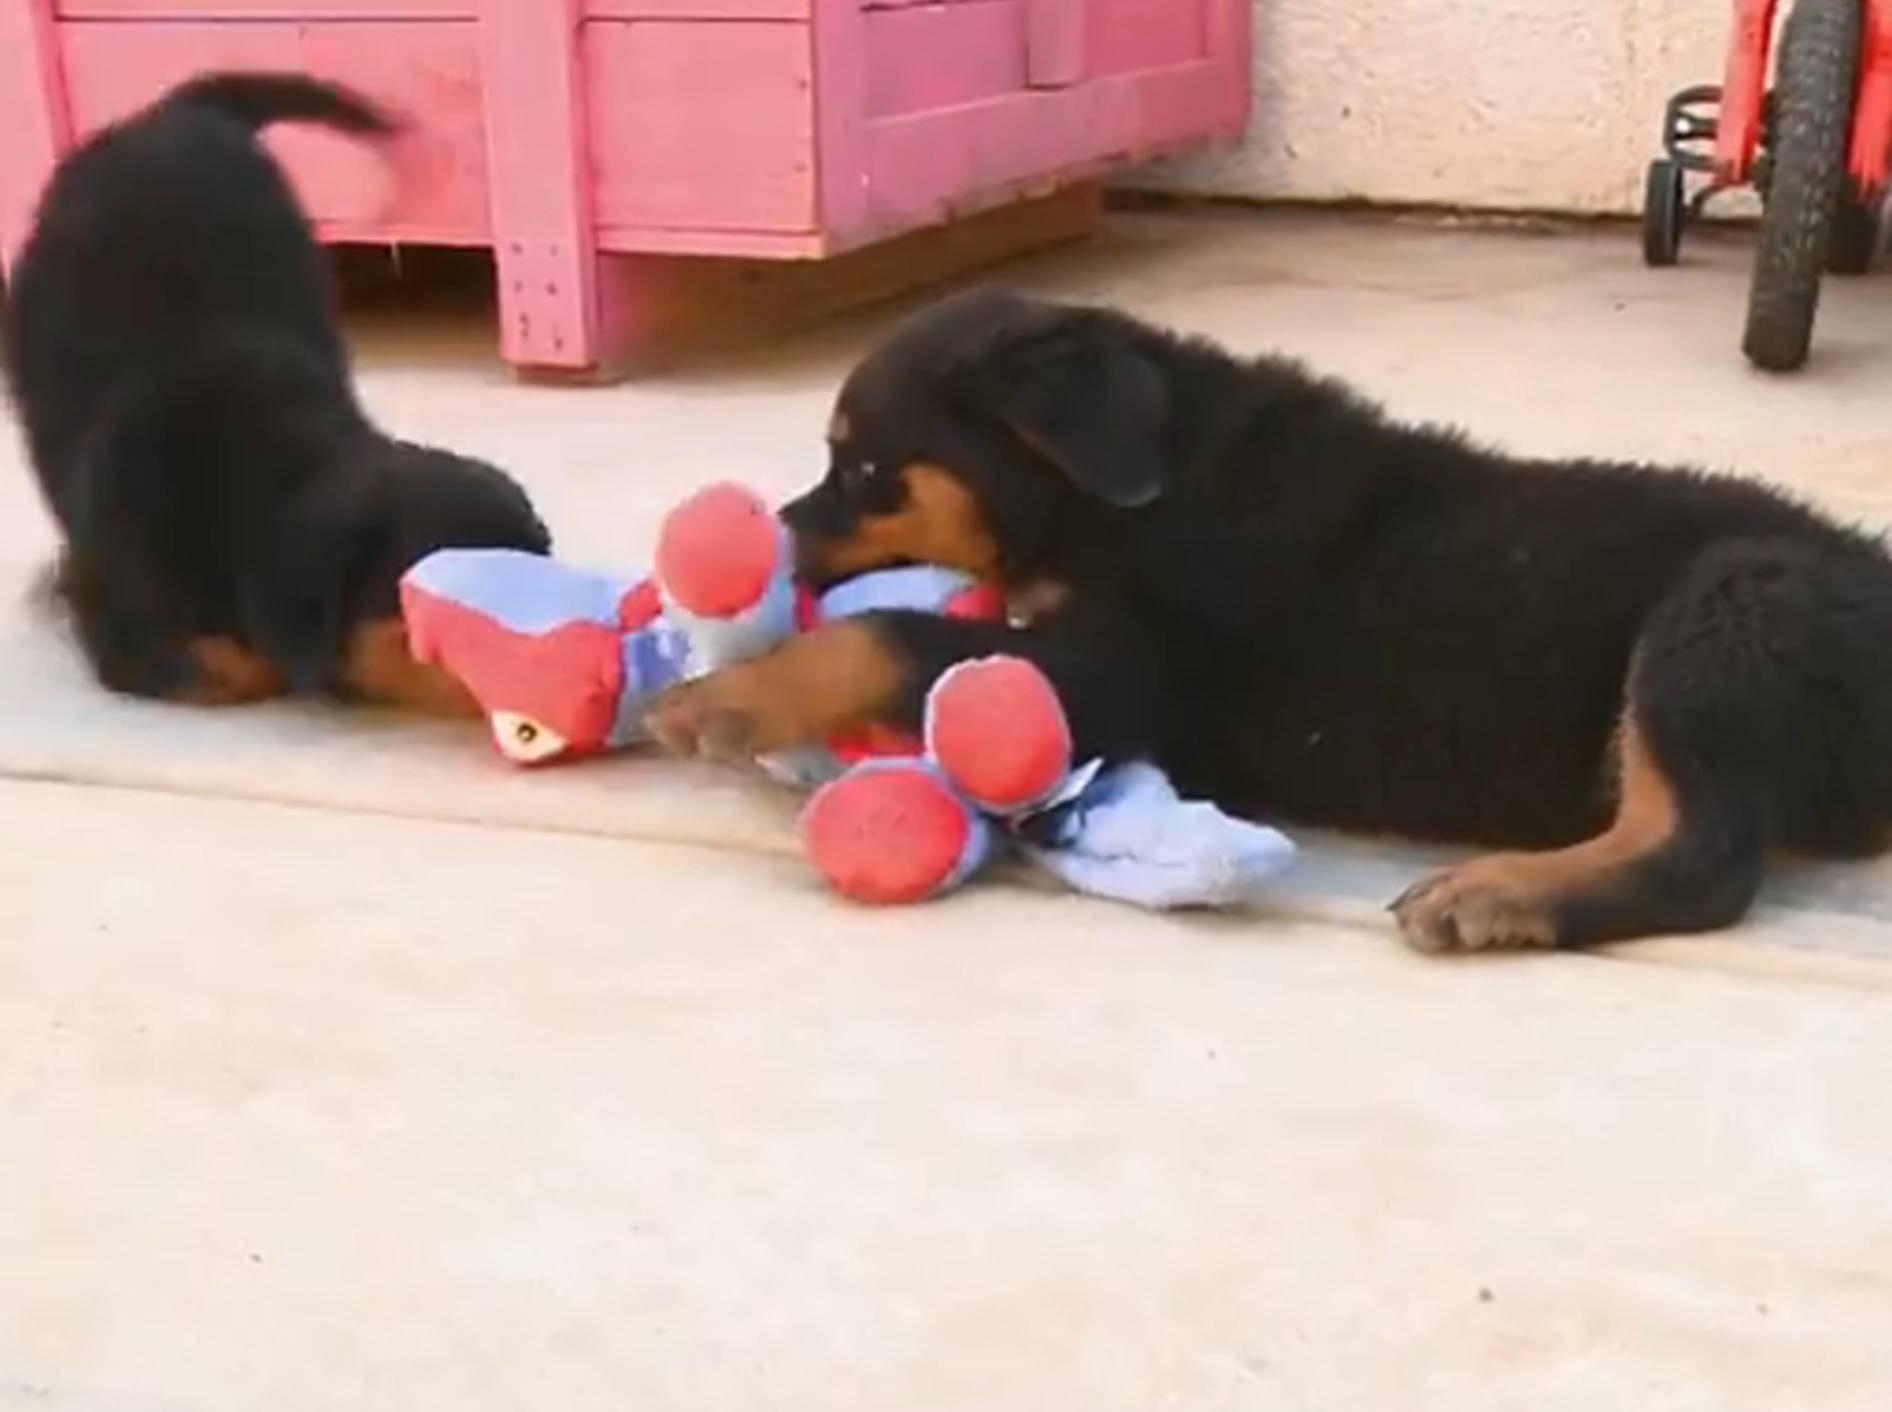 Rottweiler-Welpen: Der Kampf mit dem Drachen – Bild: YouTube / The Pet Collective